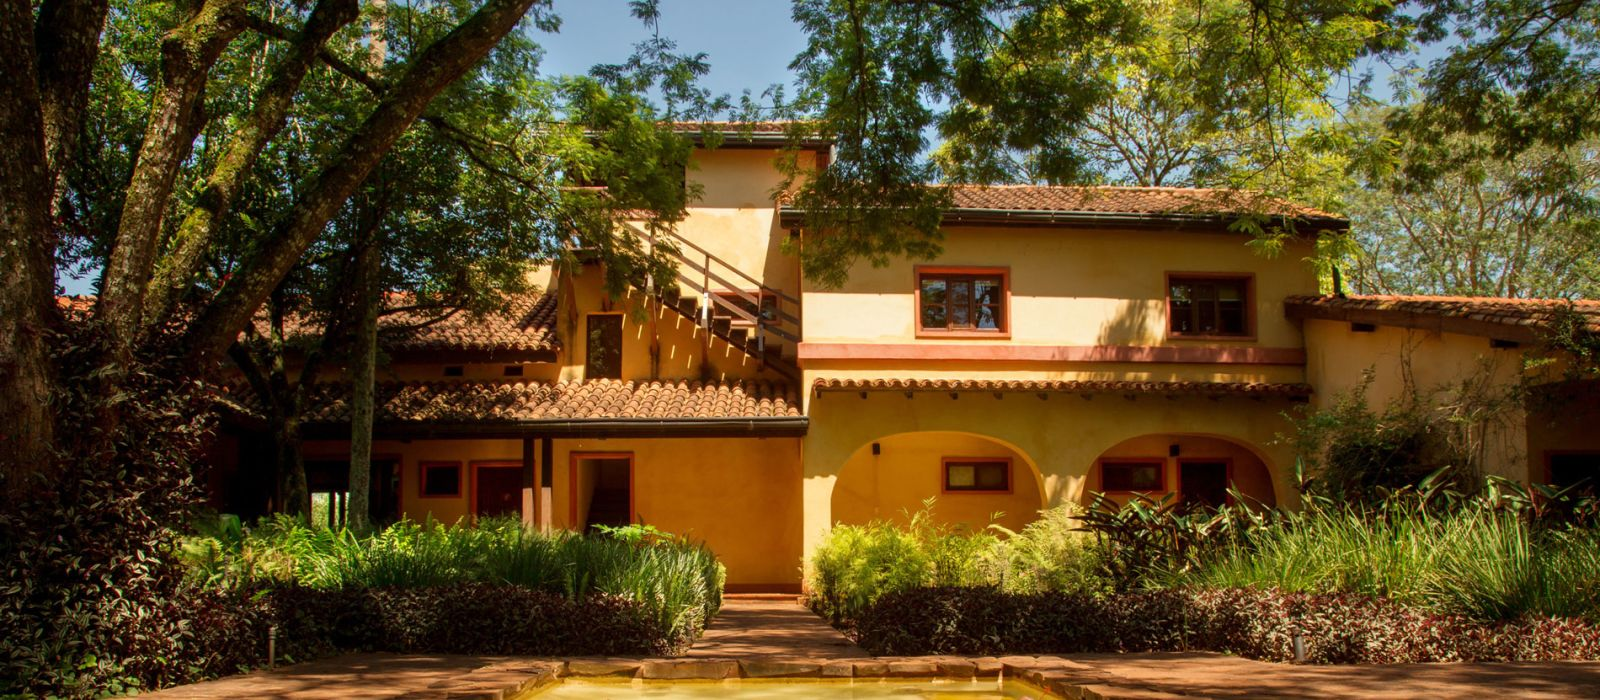 Hotel Puerto Bemberg Lodge Argentinien